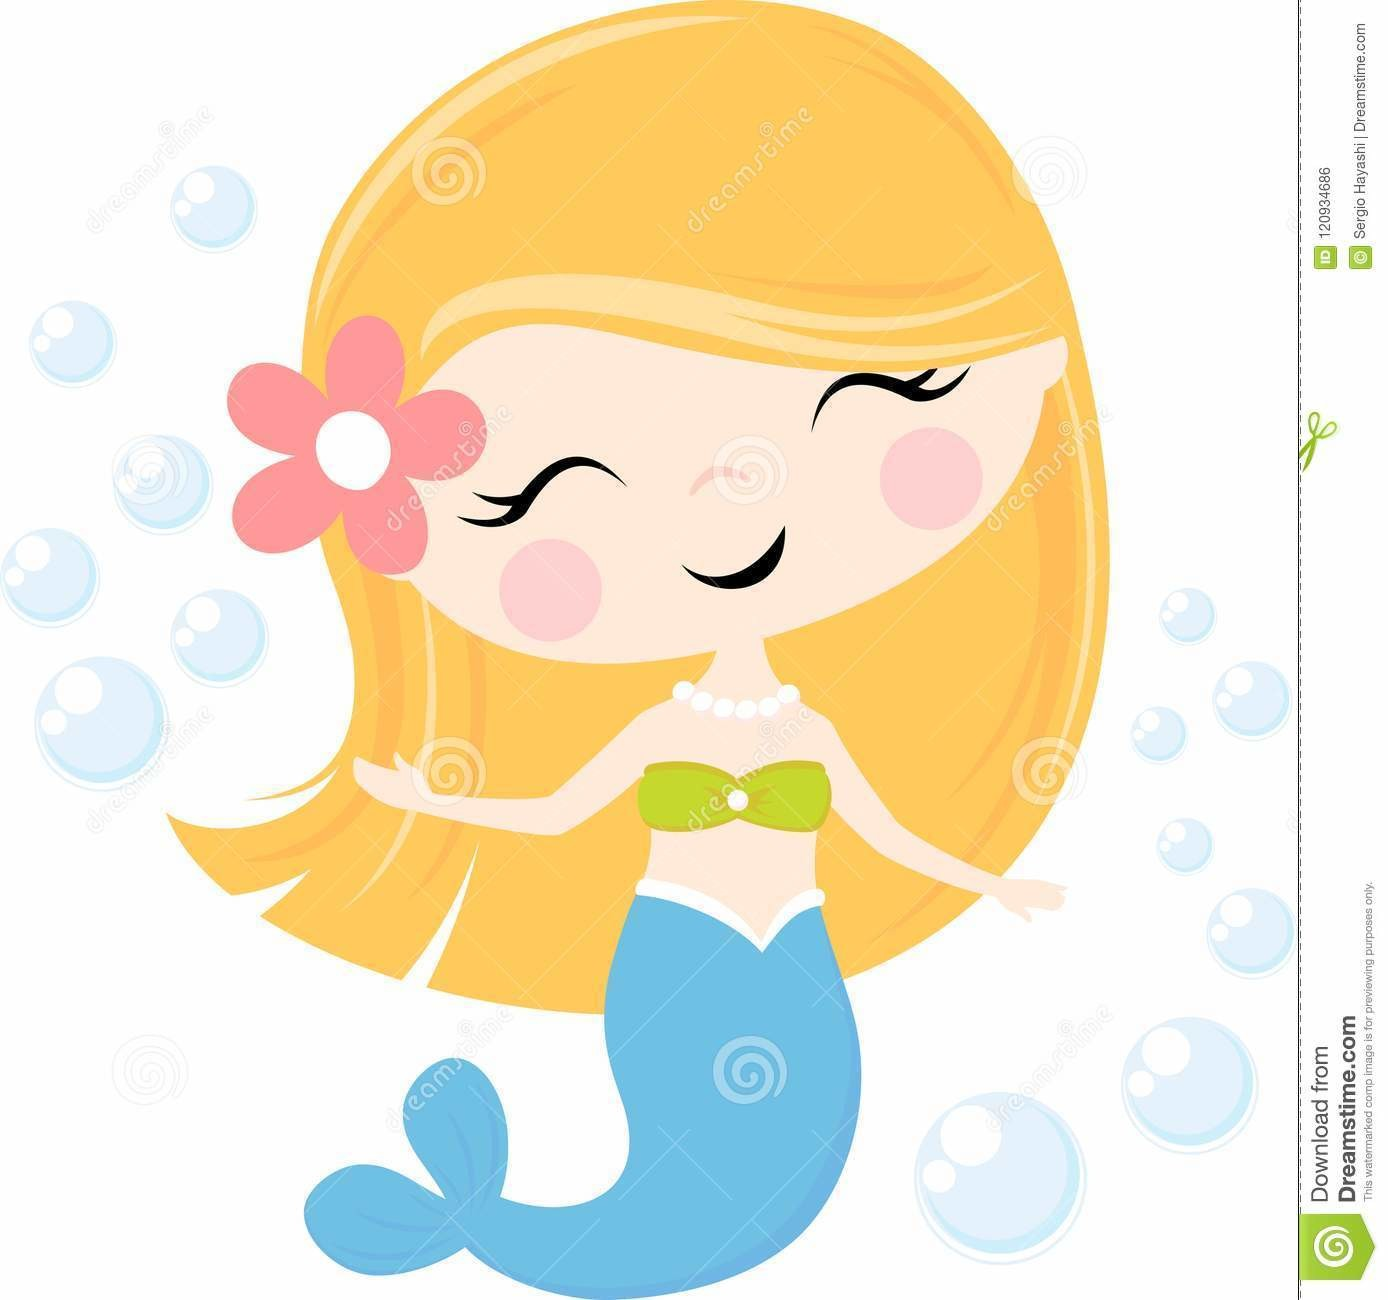 f726aa4cda1d7 Mermaids, Unicorns & Glitter OH MY! Ages 2-3